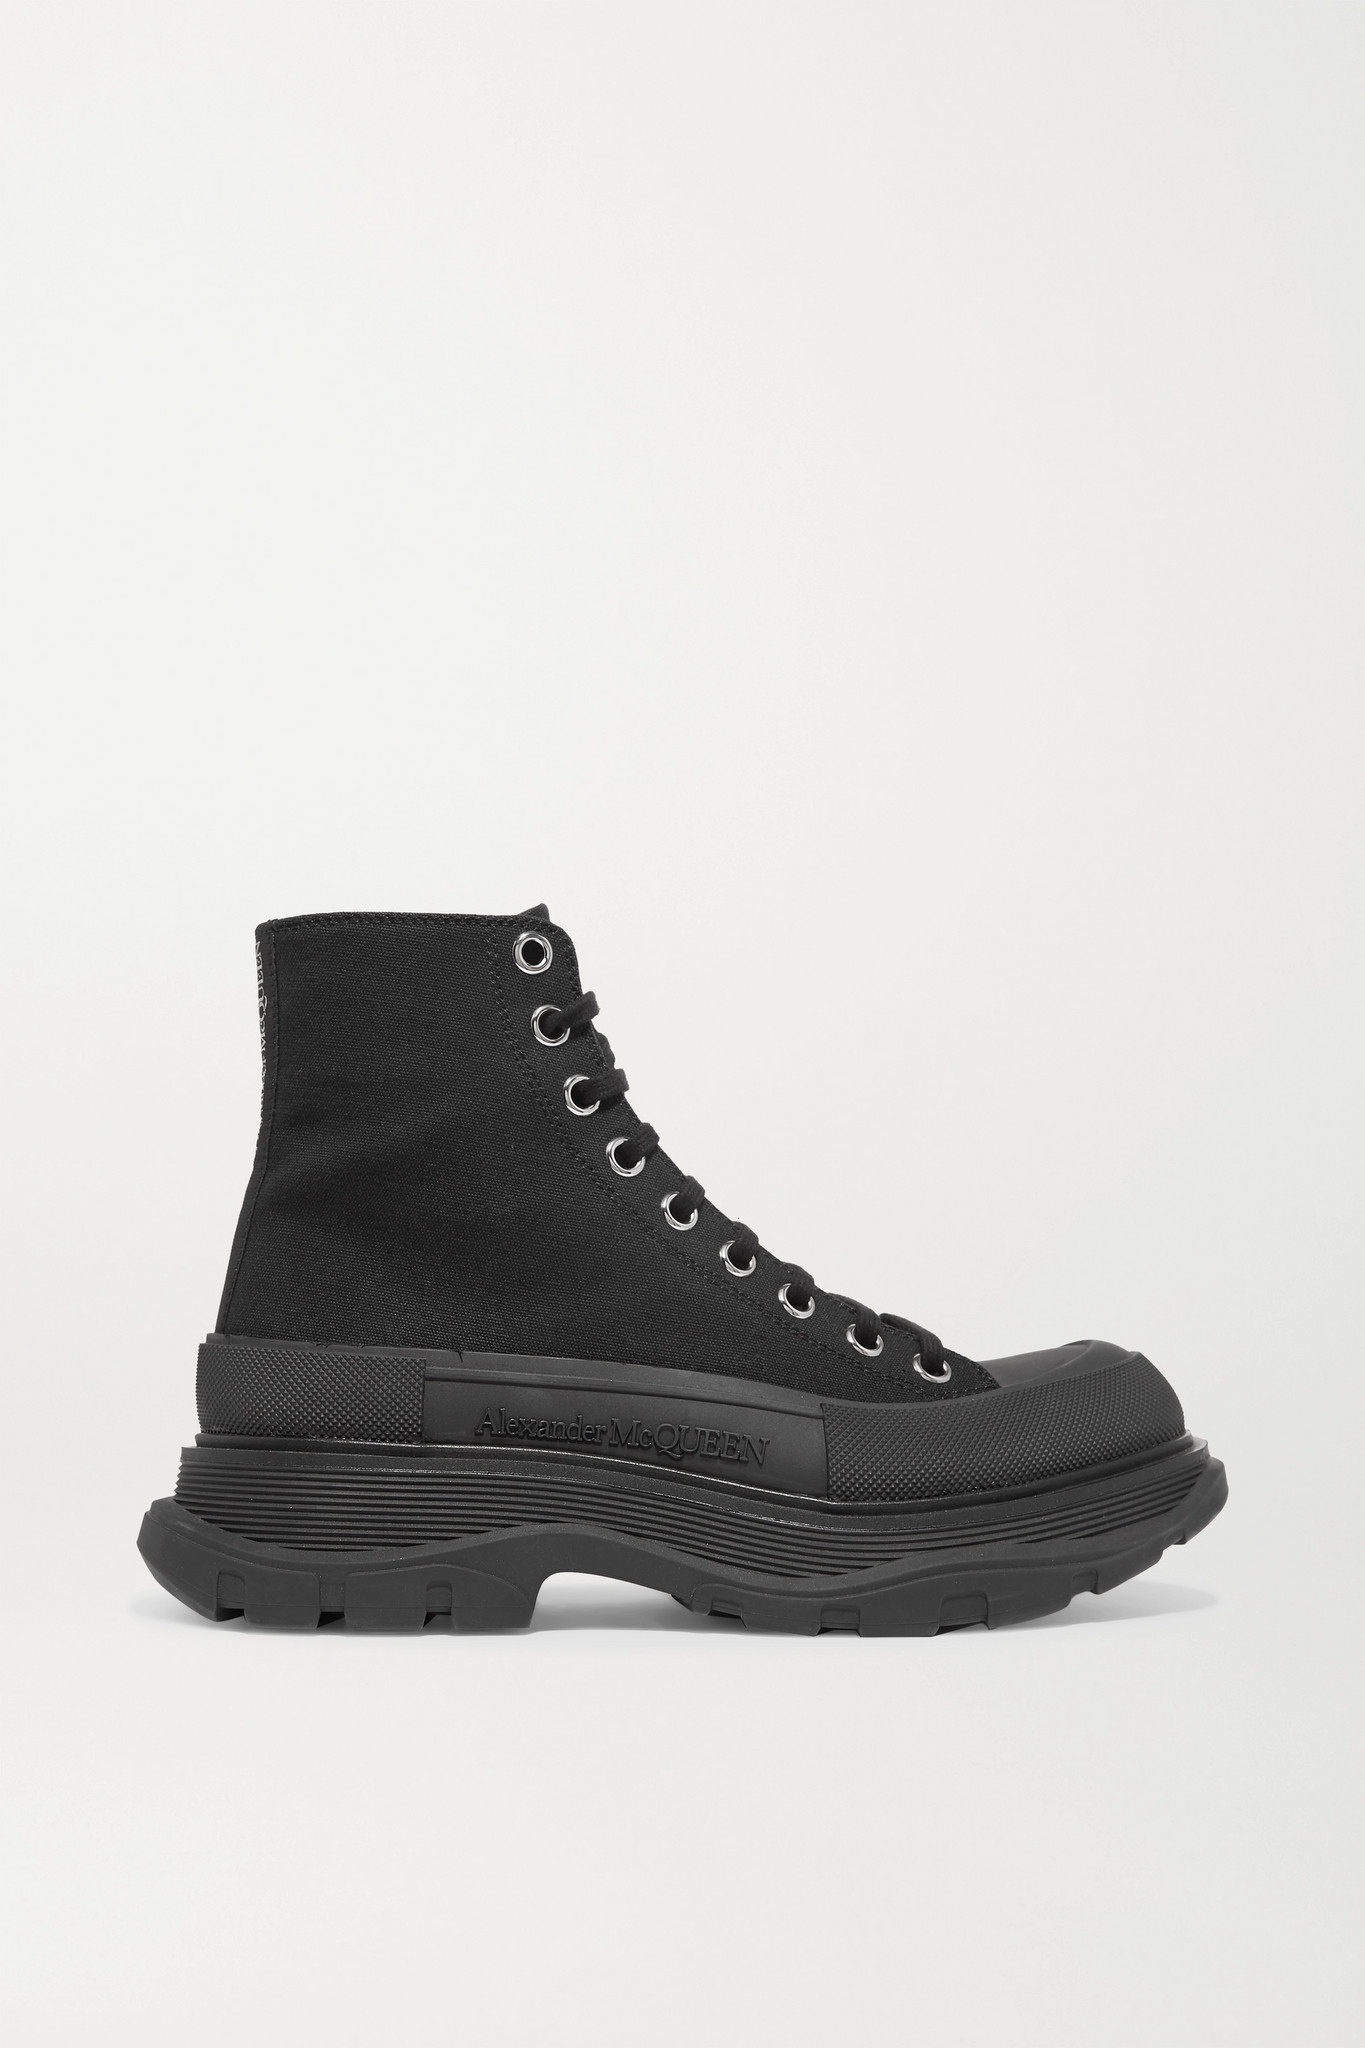 ALEXANDER MCQUEEN - 帆布橡胶厚底踝靴 - 黑色 - IT39.5